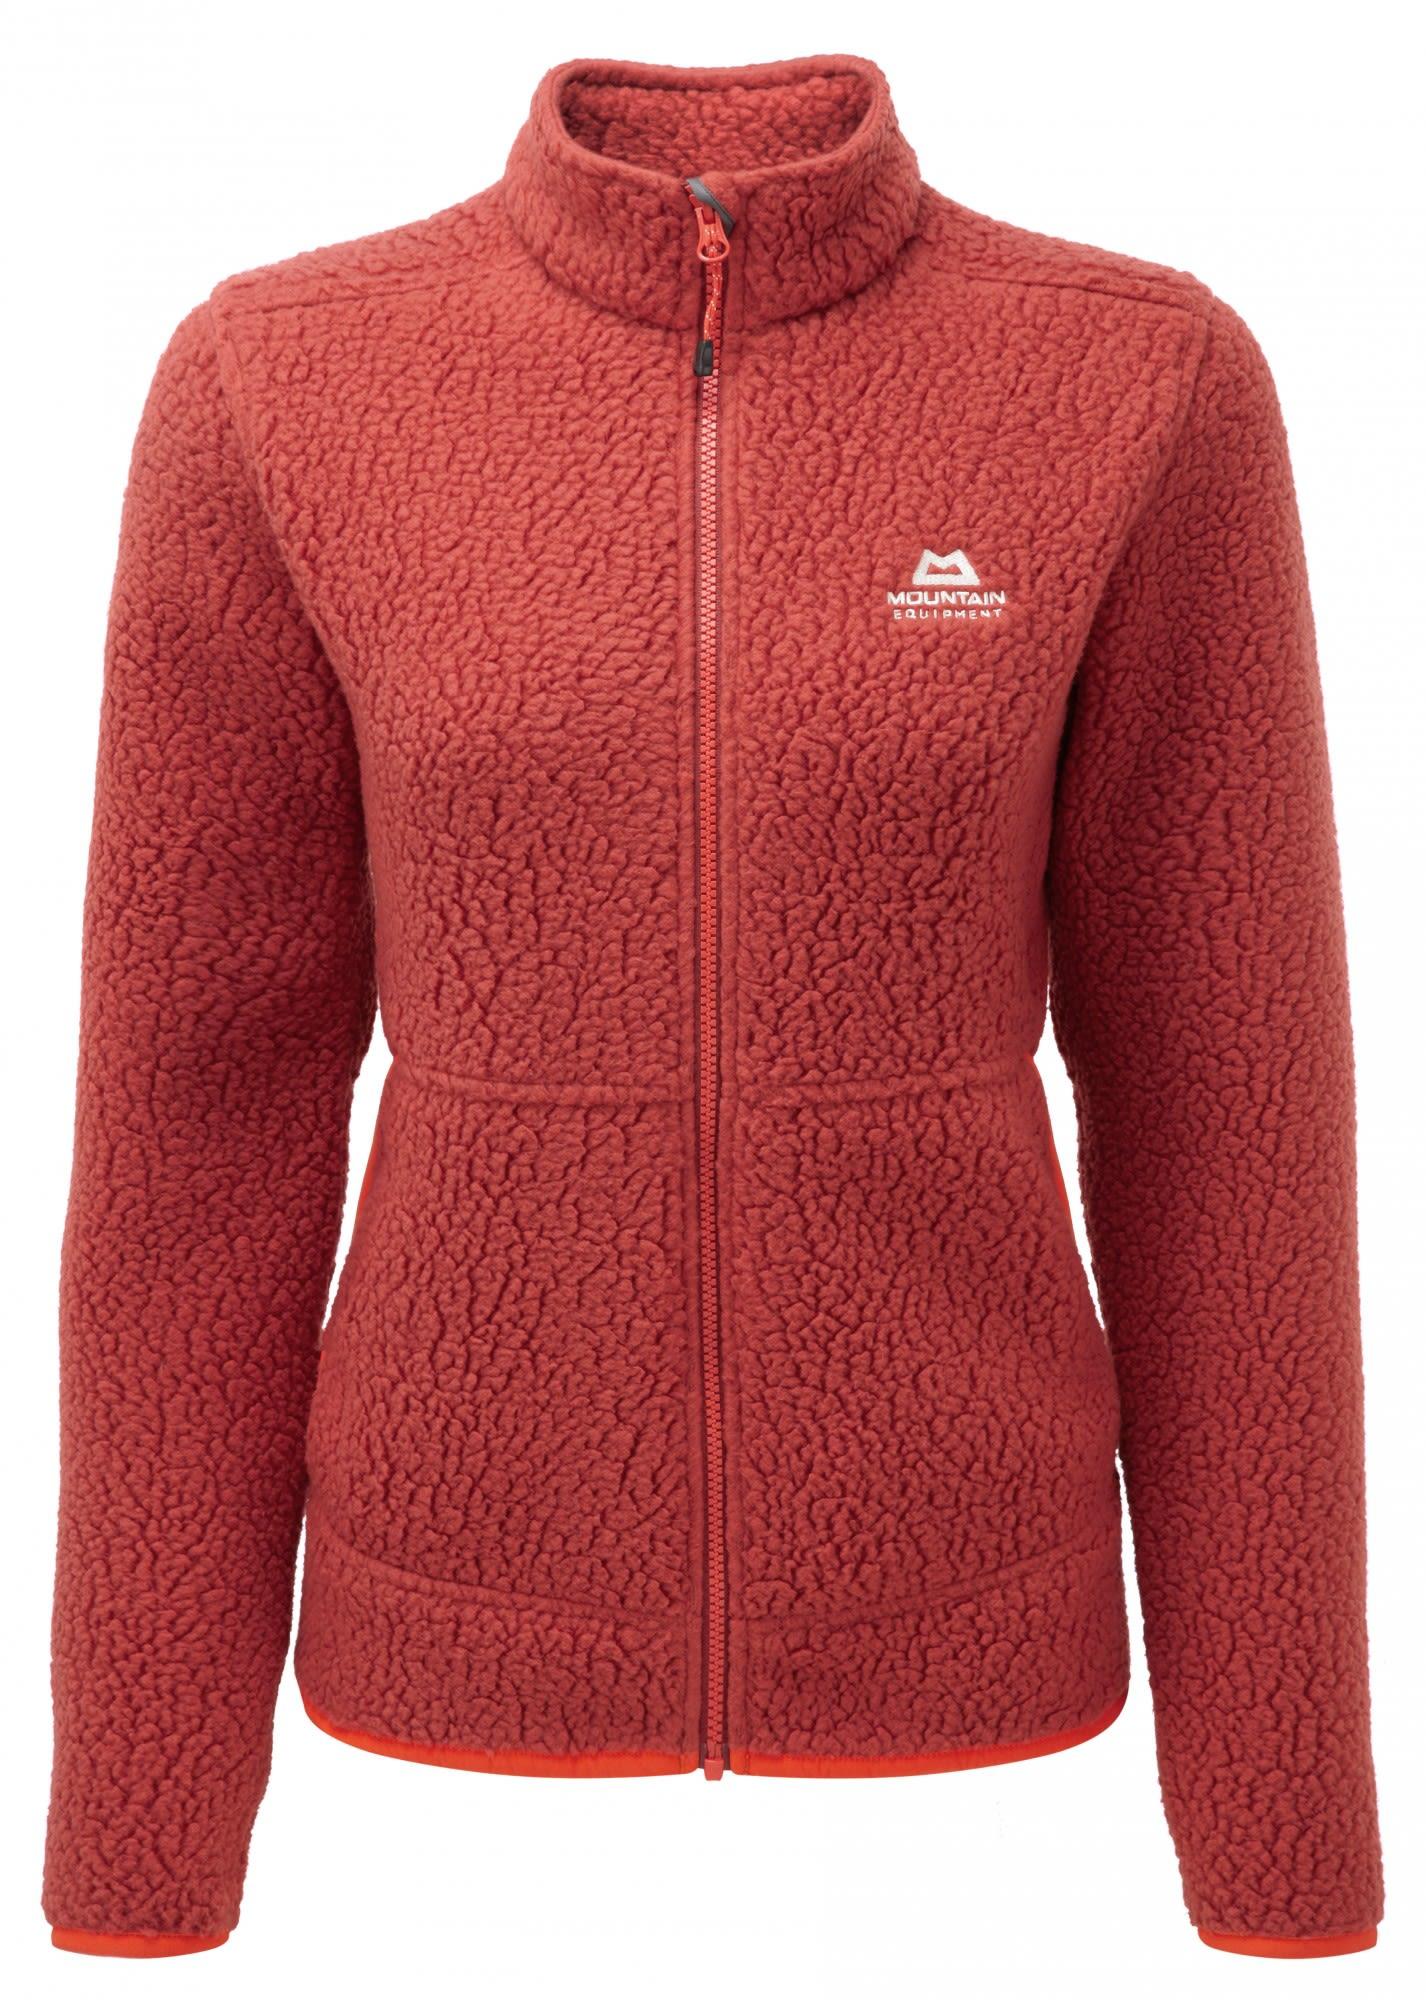 Mountain Equipment Moreno Jacket Rot, Female Polartec® S -10 -Farbe Henna, S -1